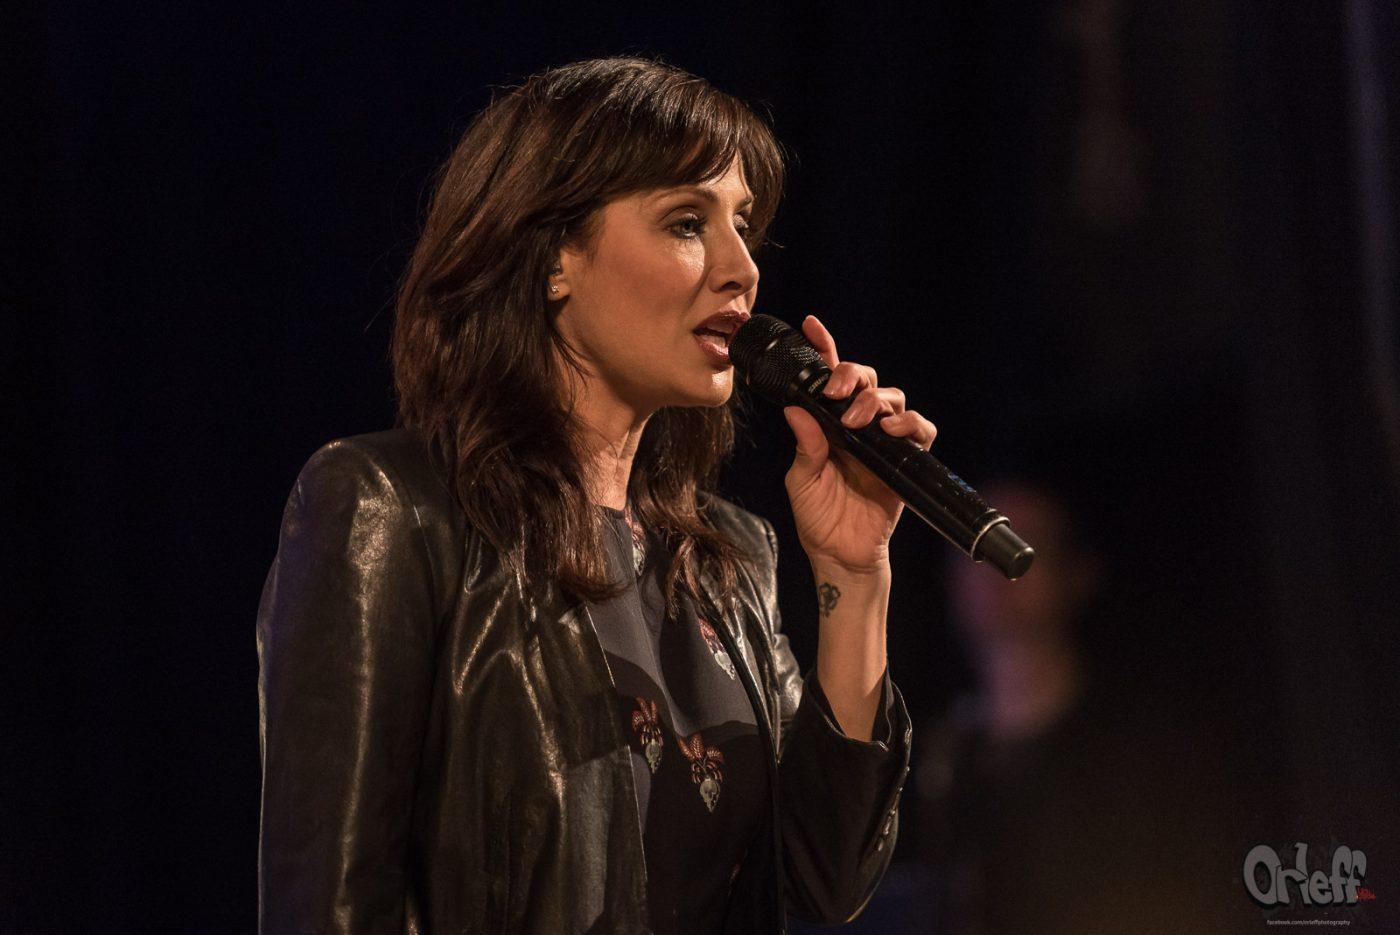 Natalie Imbruglia in Sofia, 2017